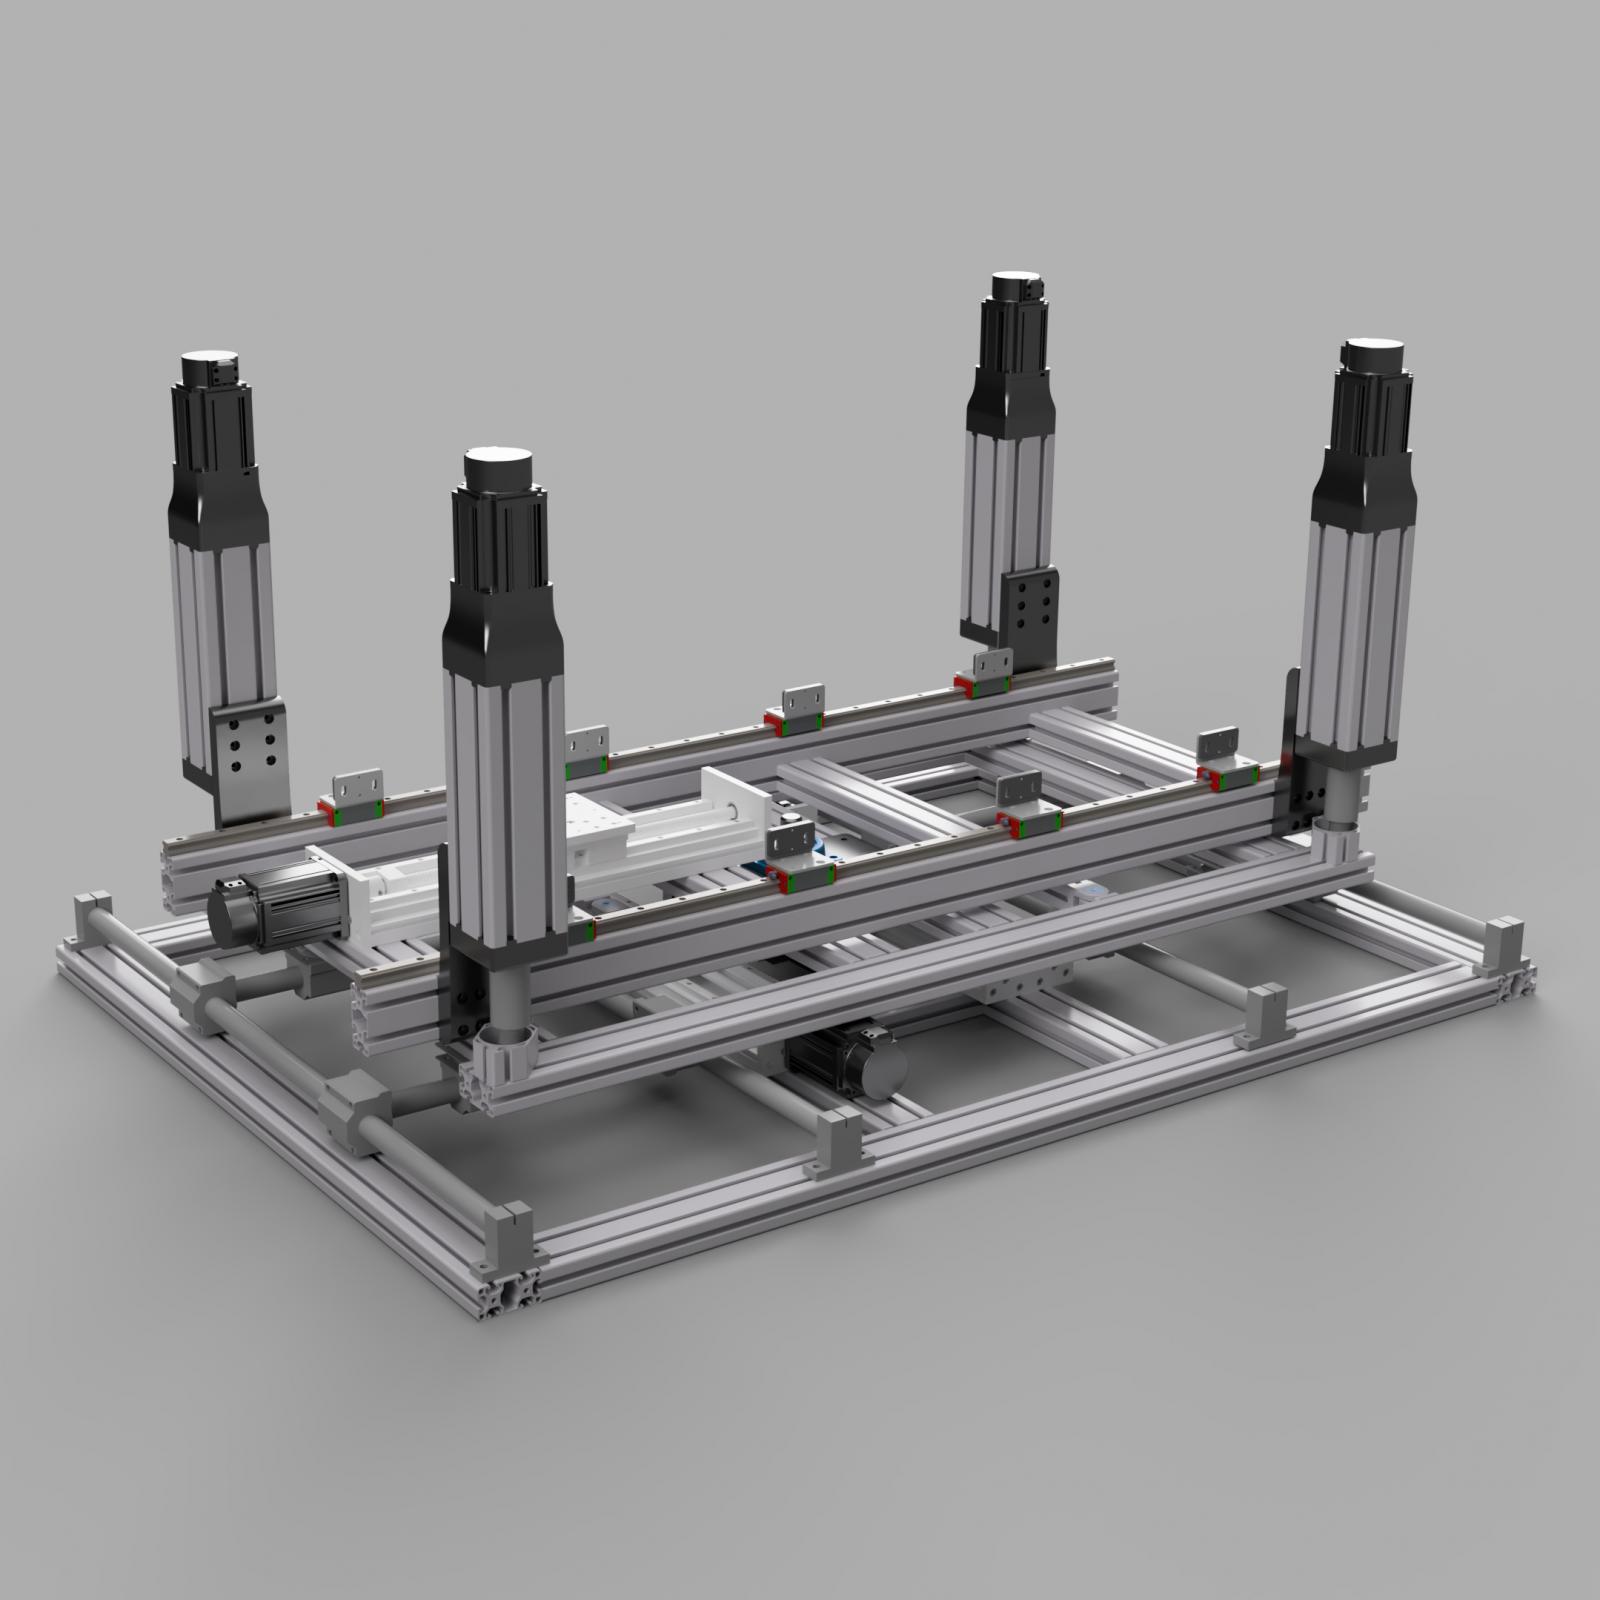 compact-6dof-platform-4k-no-p1x-sq.png